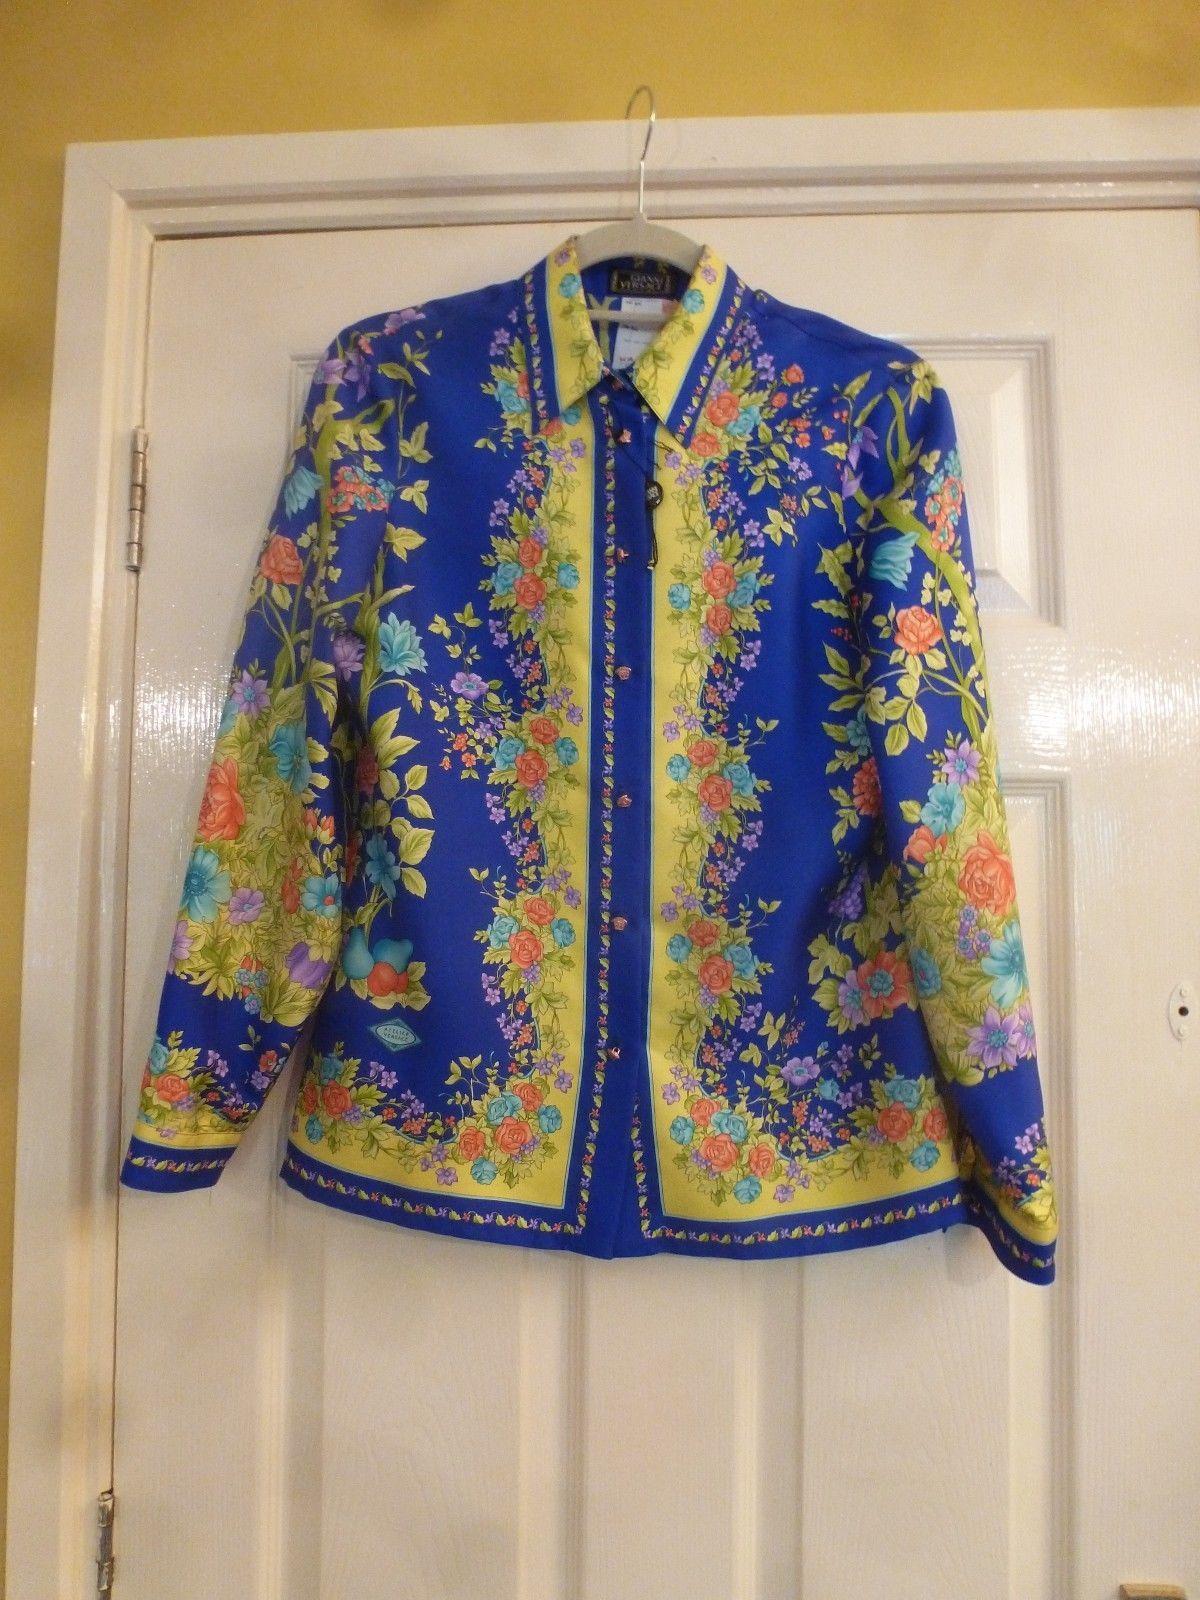 f88a85ebe2 980.78   Gianni Versace Vintage Silk Shirt Medusa Buttons Royal Blue ...